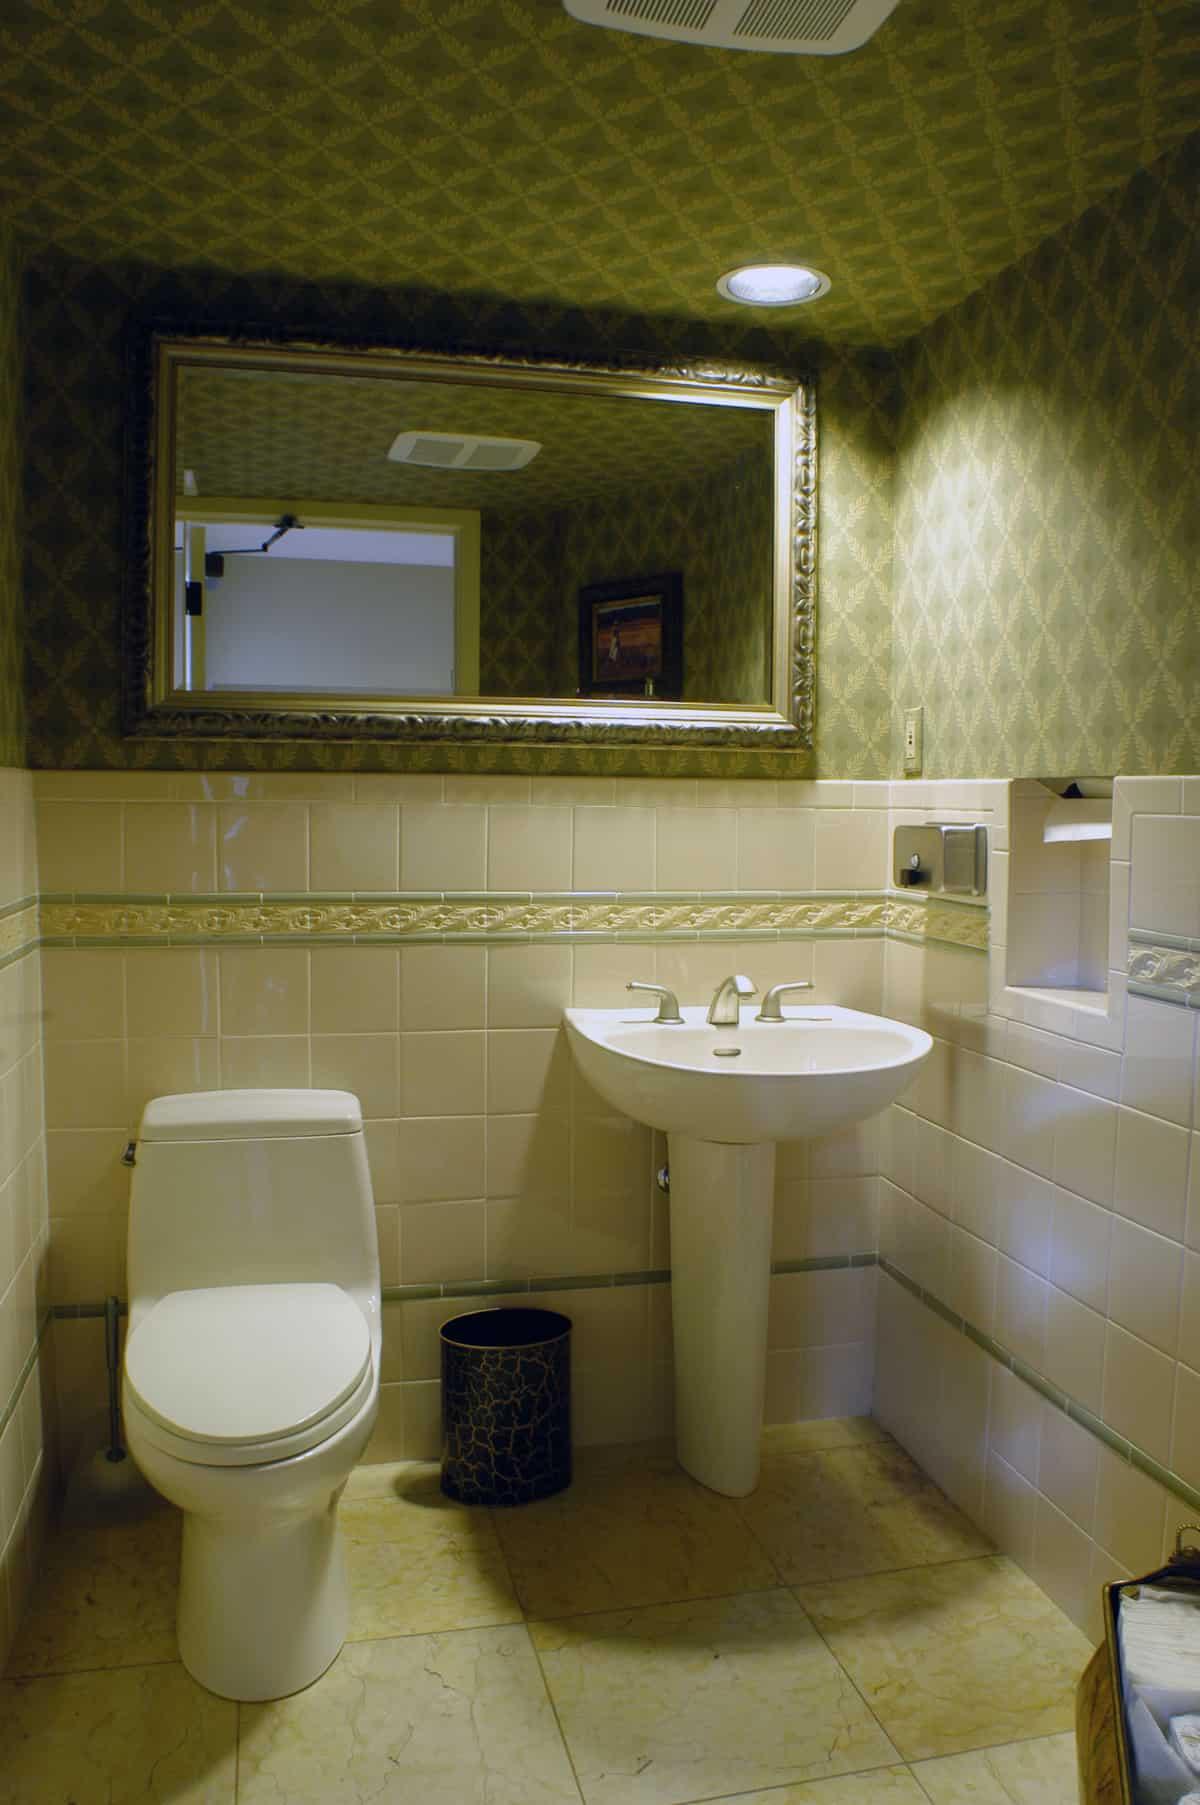 remodeled customer's toilet